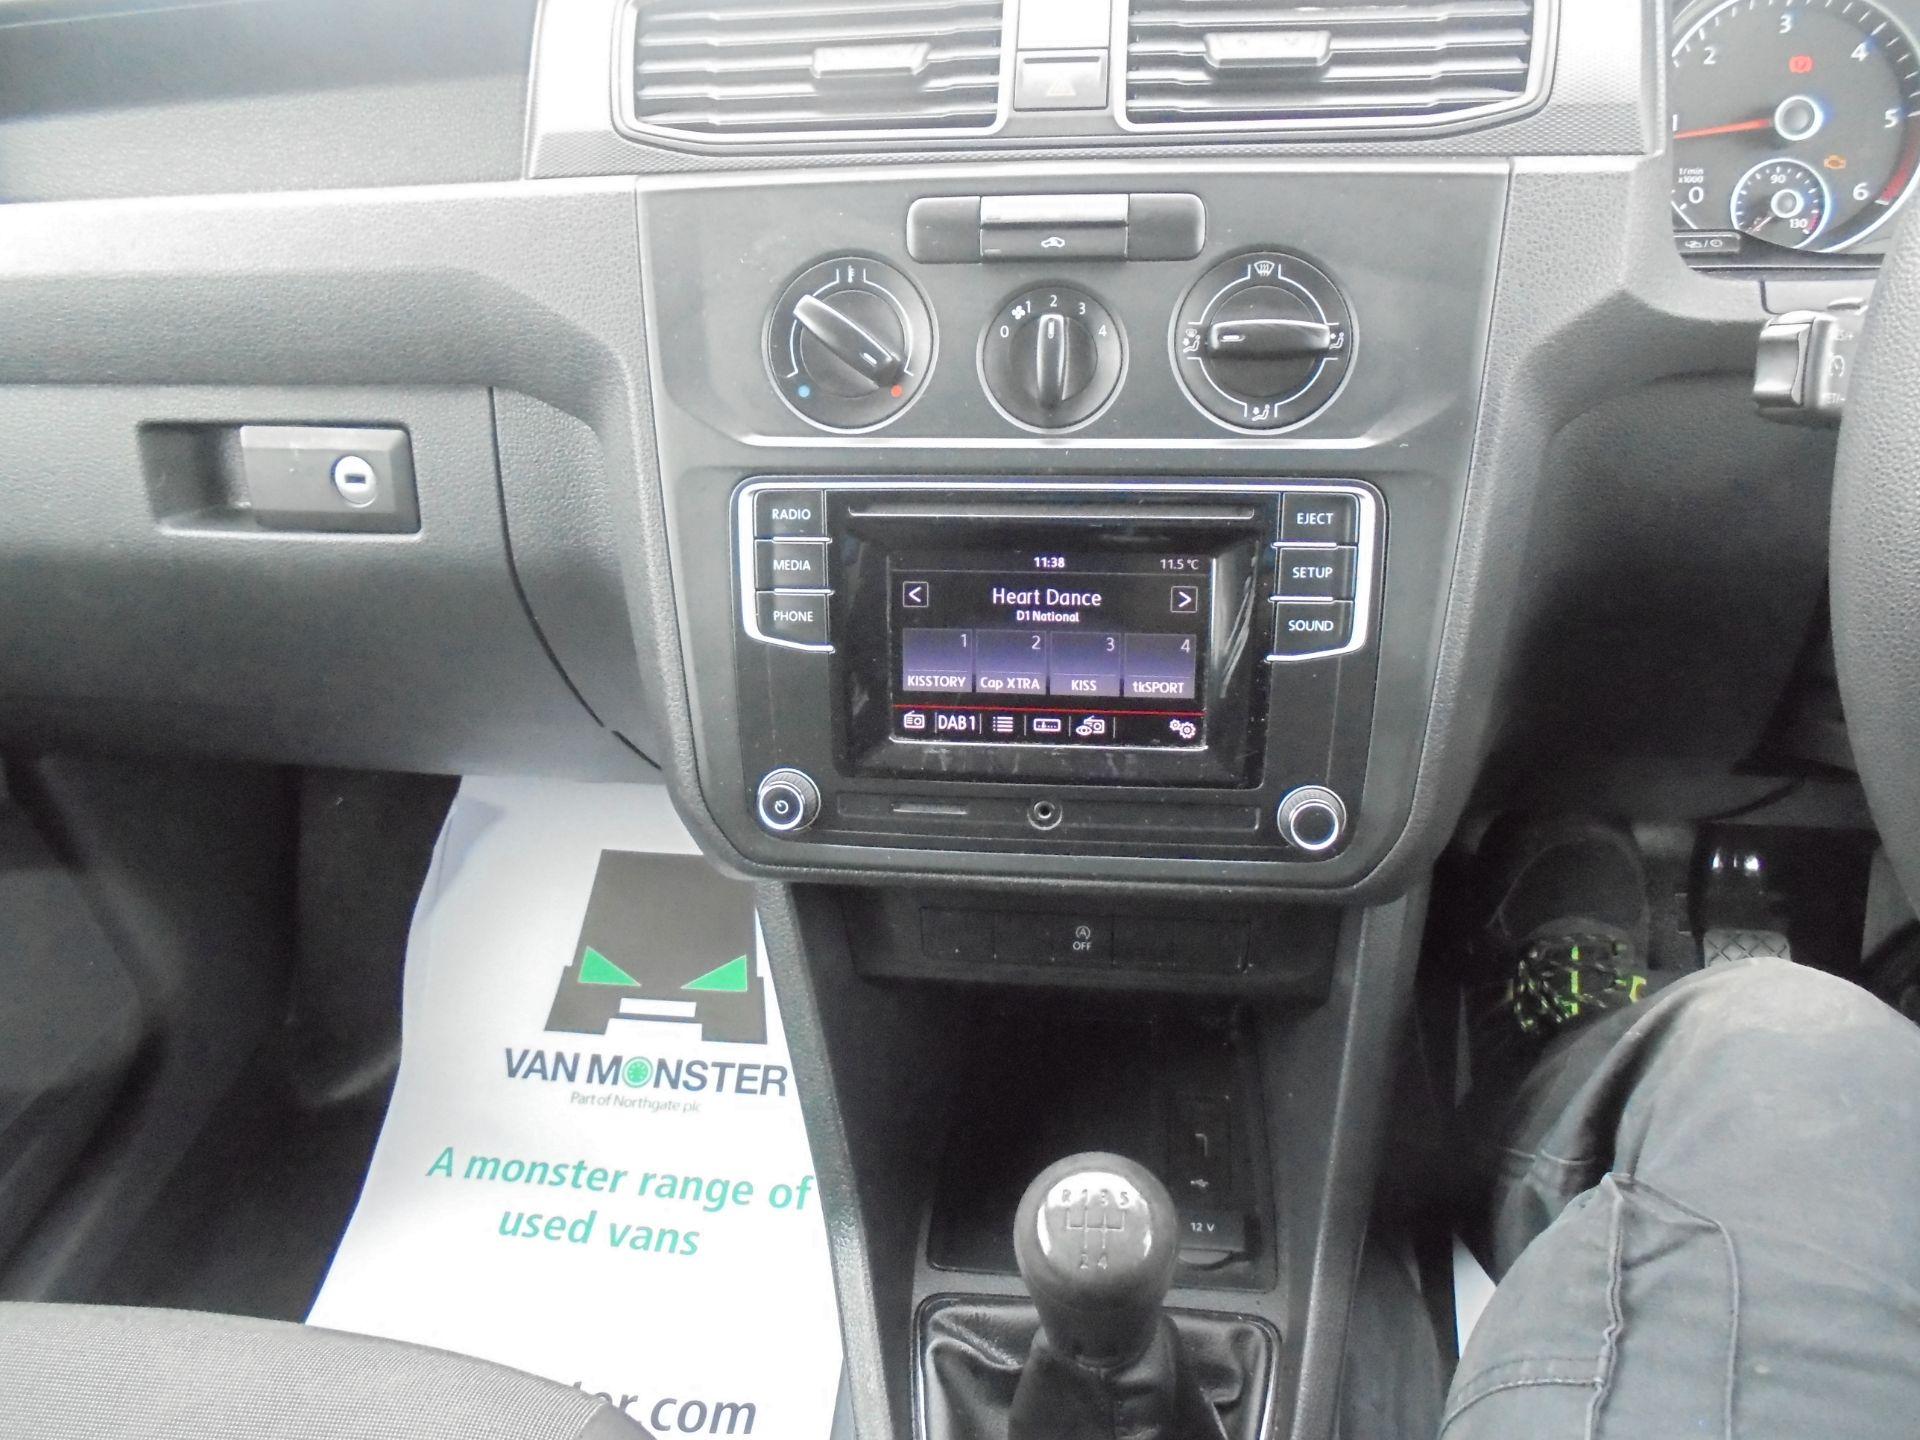 2016 Volkswagen Caddy 1.6 TDI BLUEMOTION TECH 75PS EURO 5 (GF66BZK) Image 13